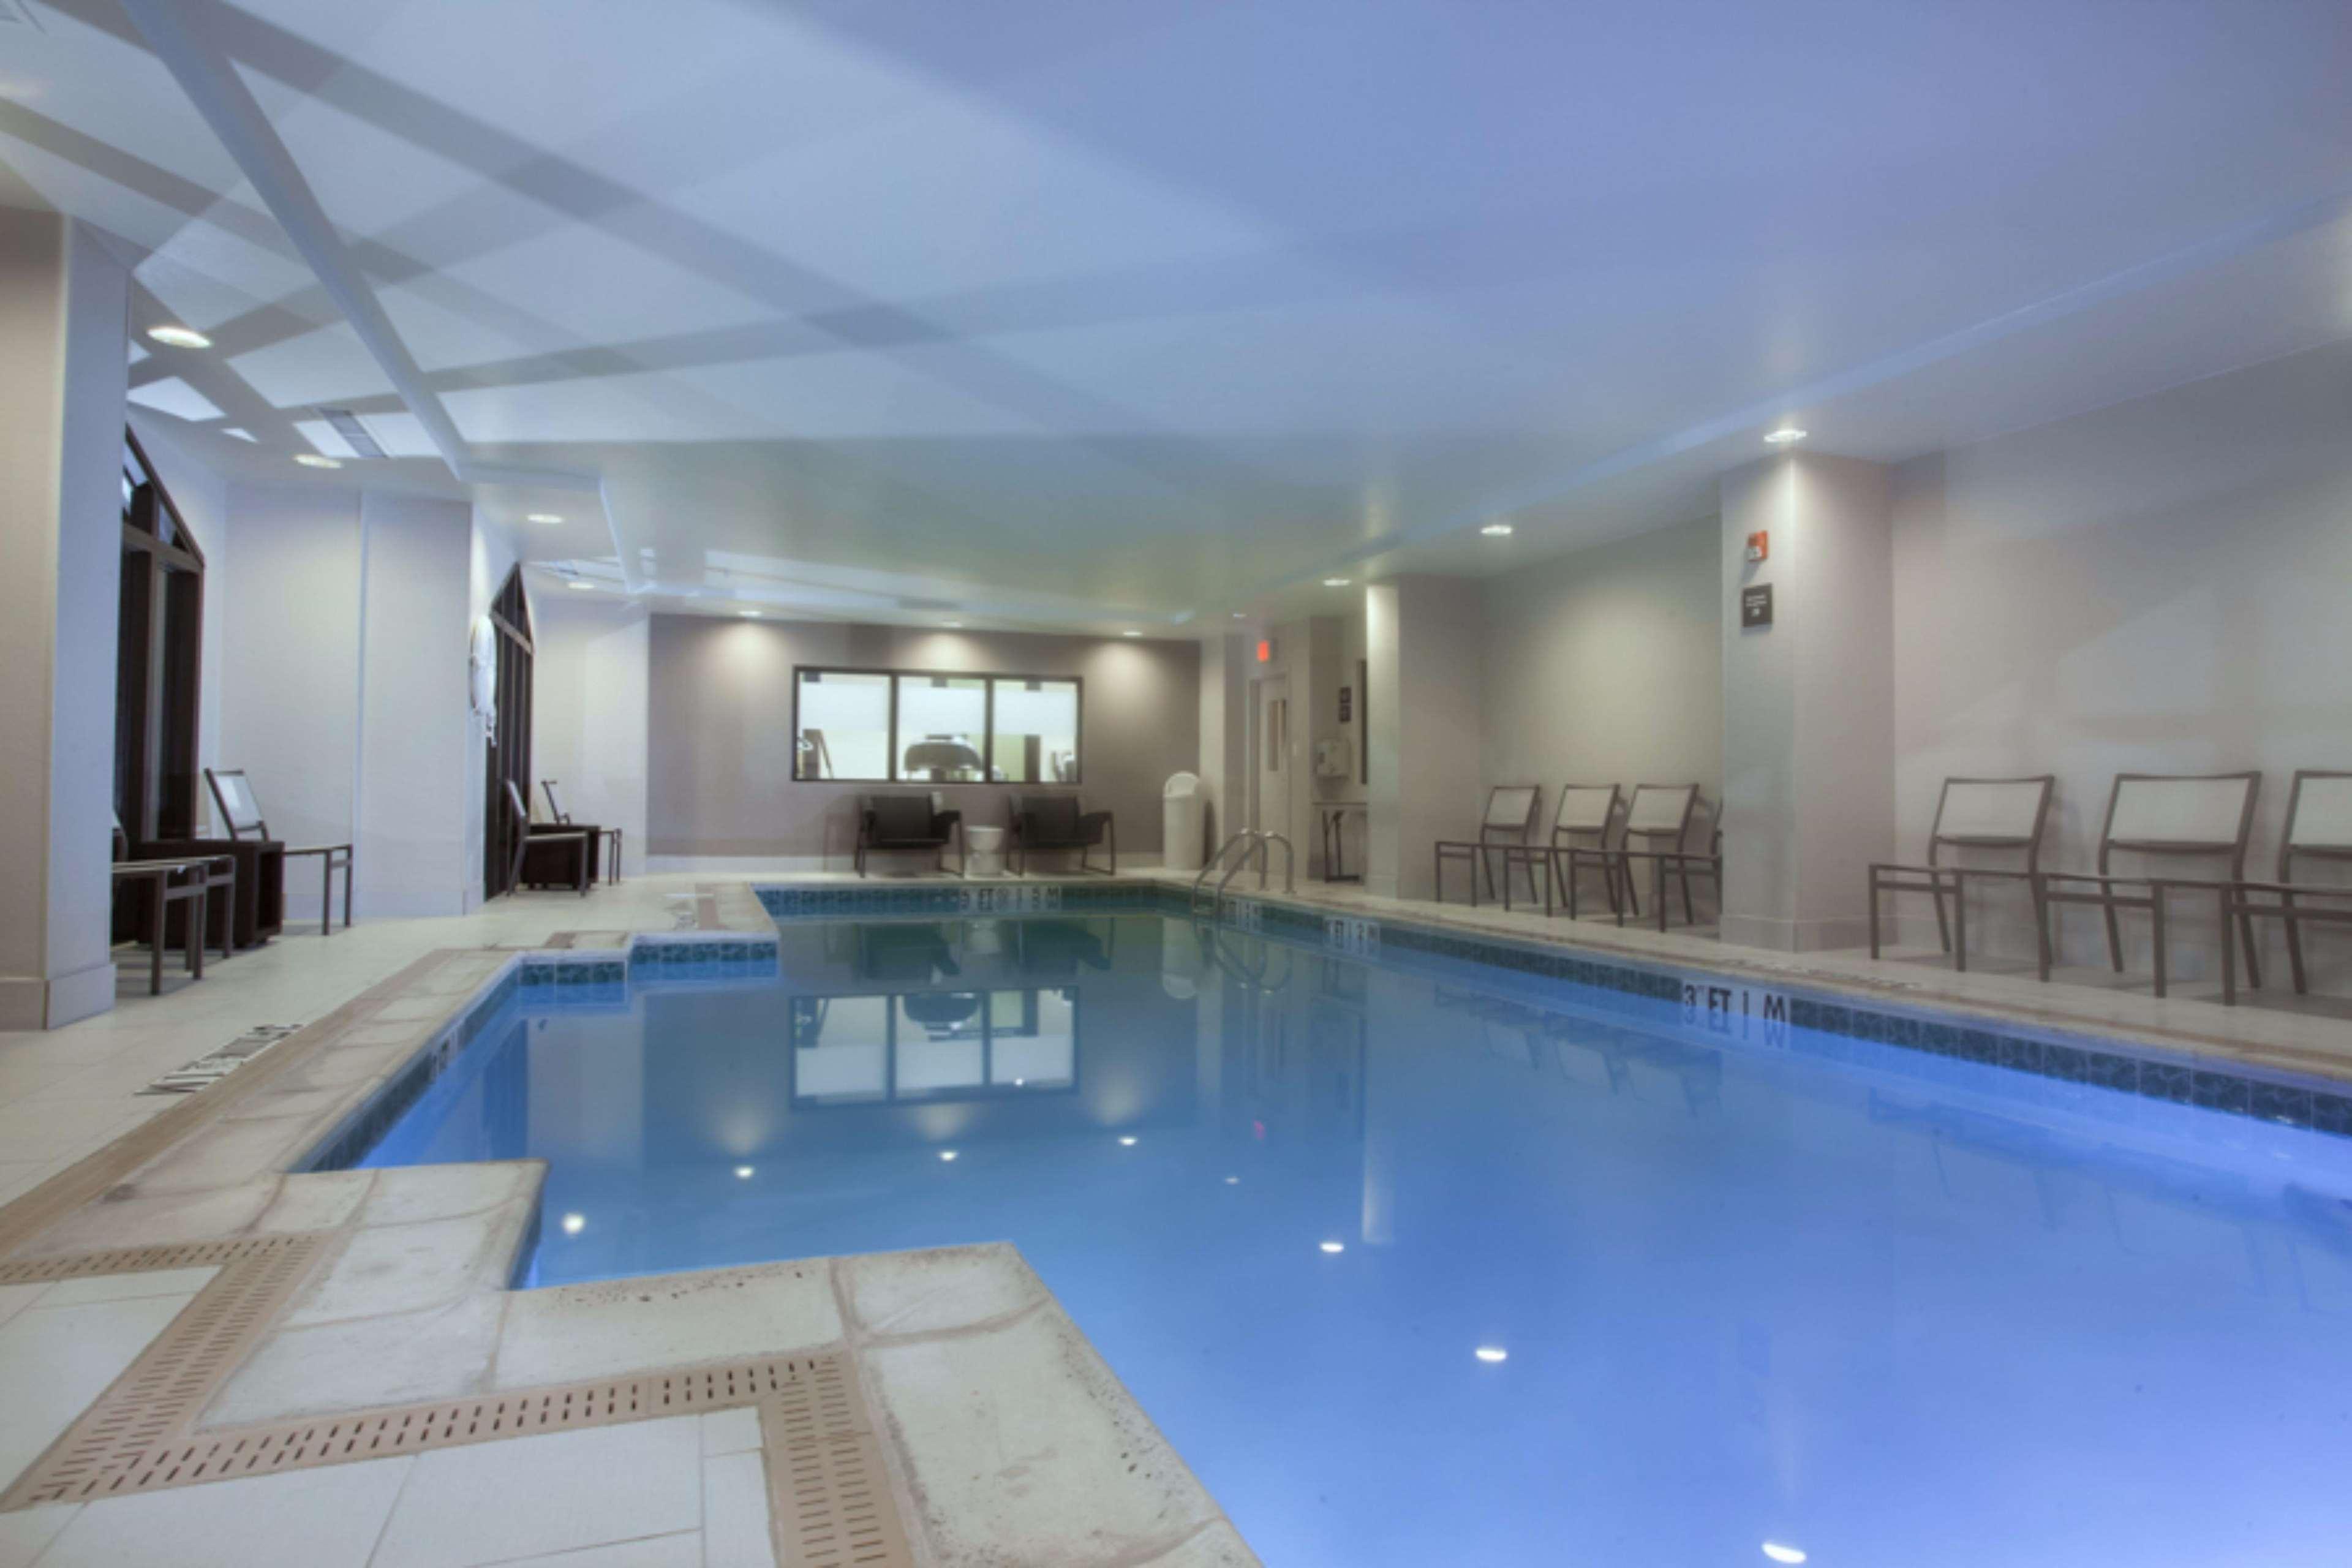 Hampton Inn & Suites Dallas-DFW Airport North-Grapevine image 6